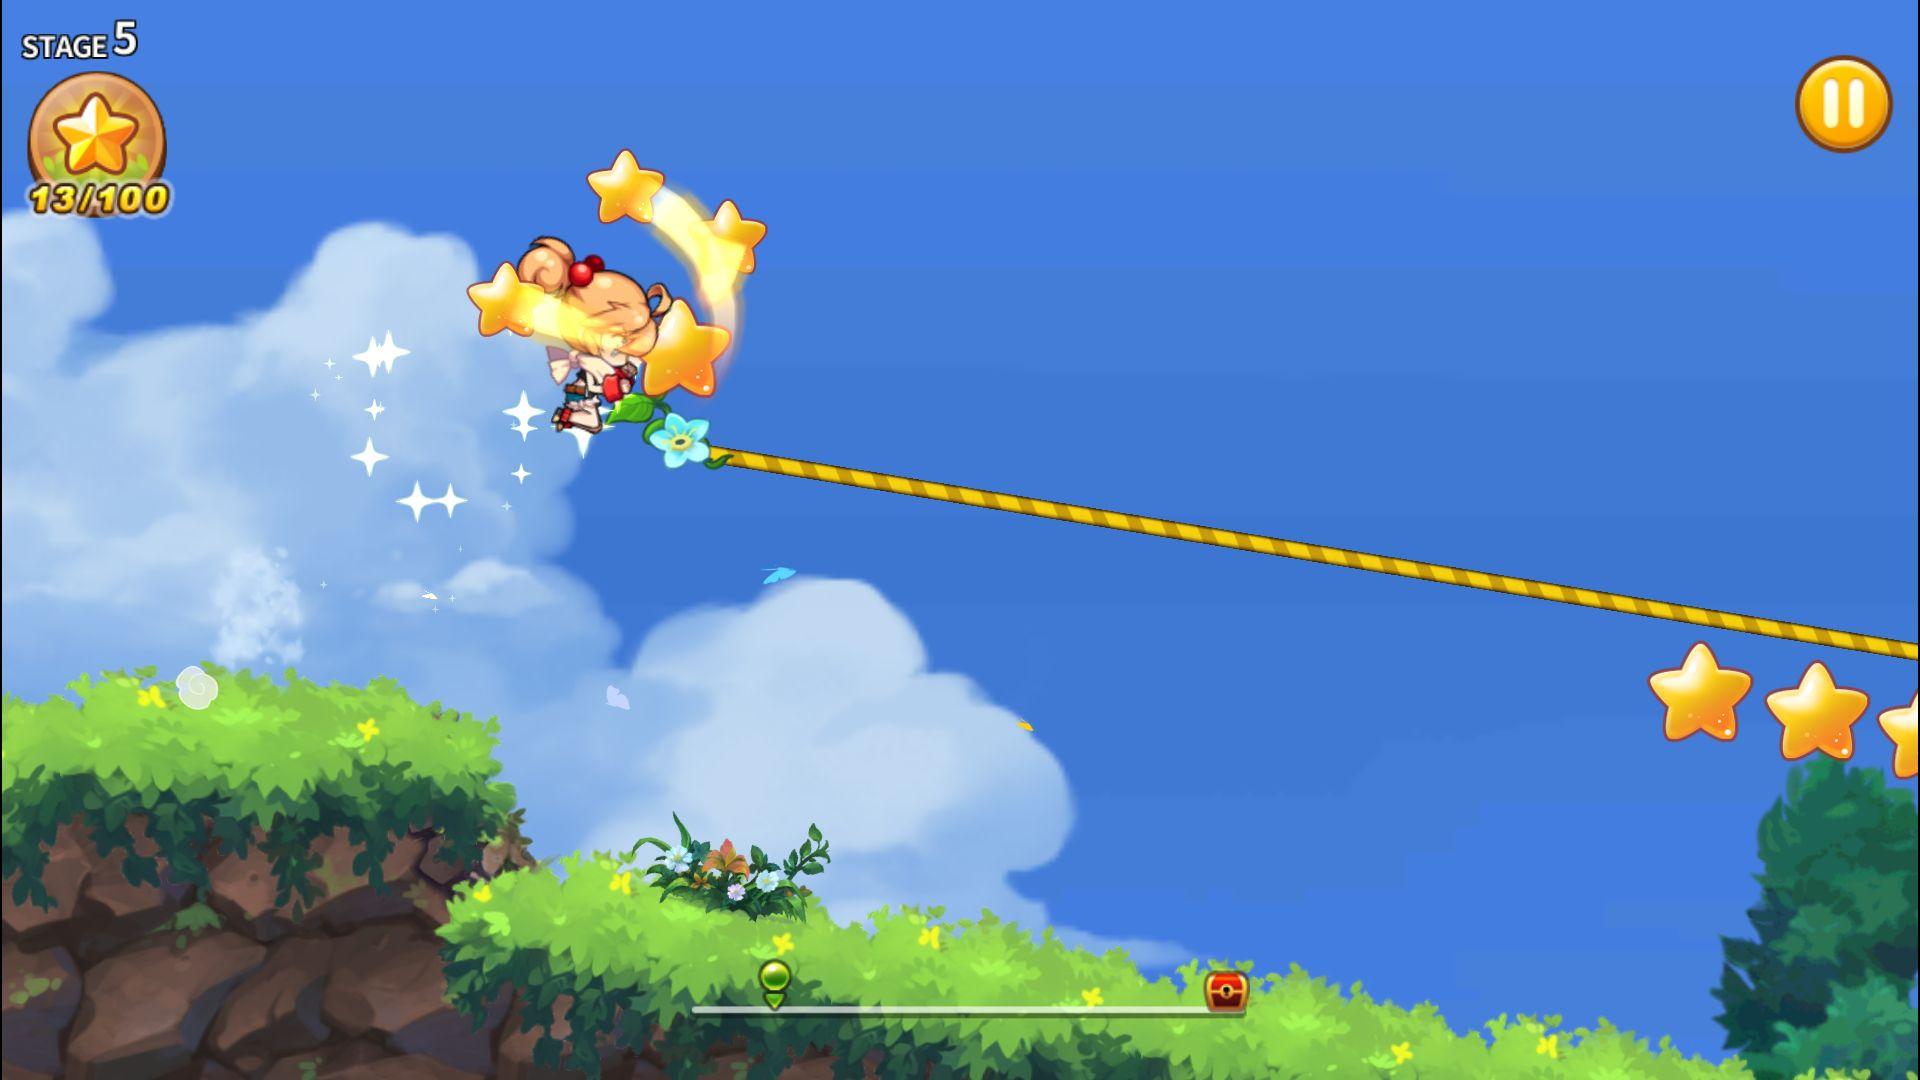 androidアプリ ウィンドランナーアドベンチャー(WIND runner adventure)攻略スクリーンショット3